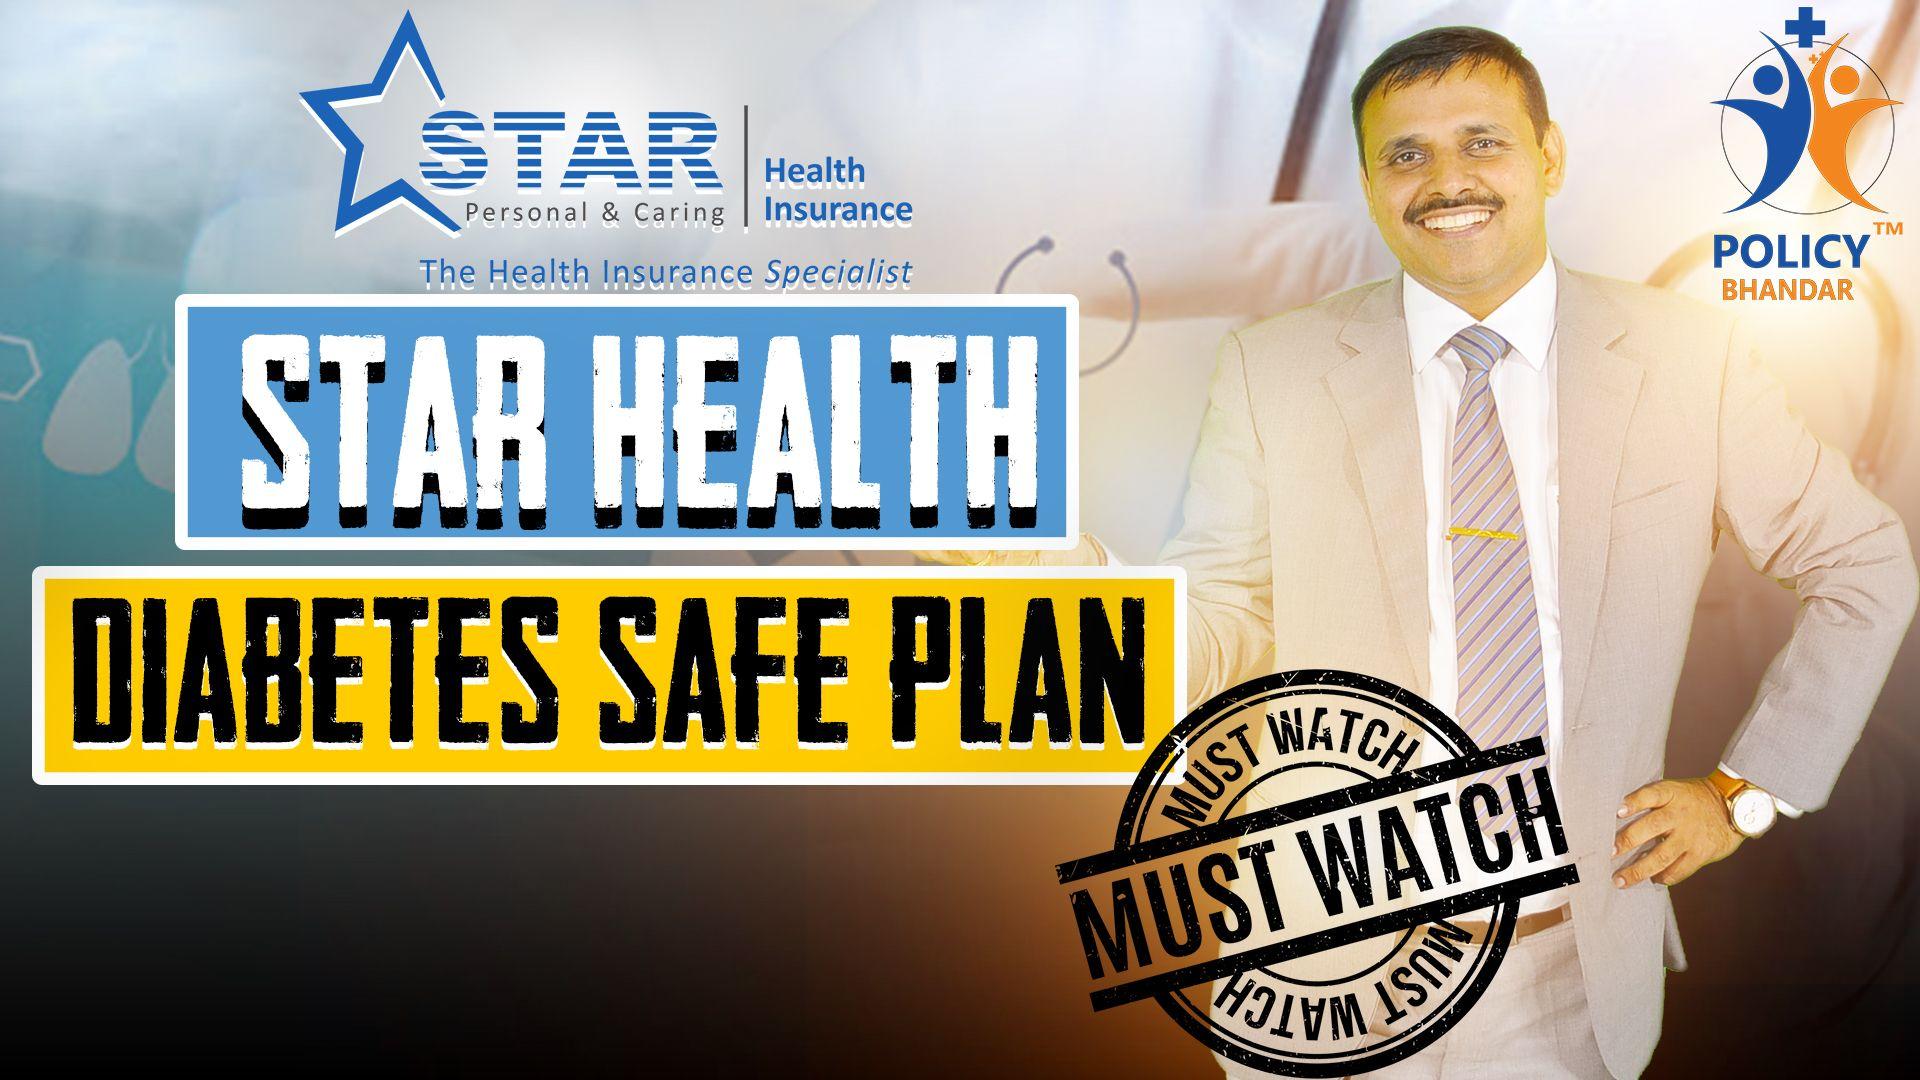 Diabetic Care Plan Expert Advice Yogendra Verma Call 9818826521